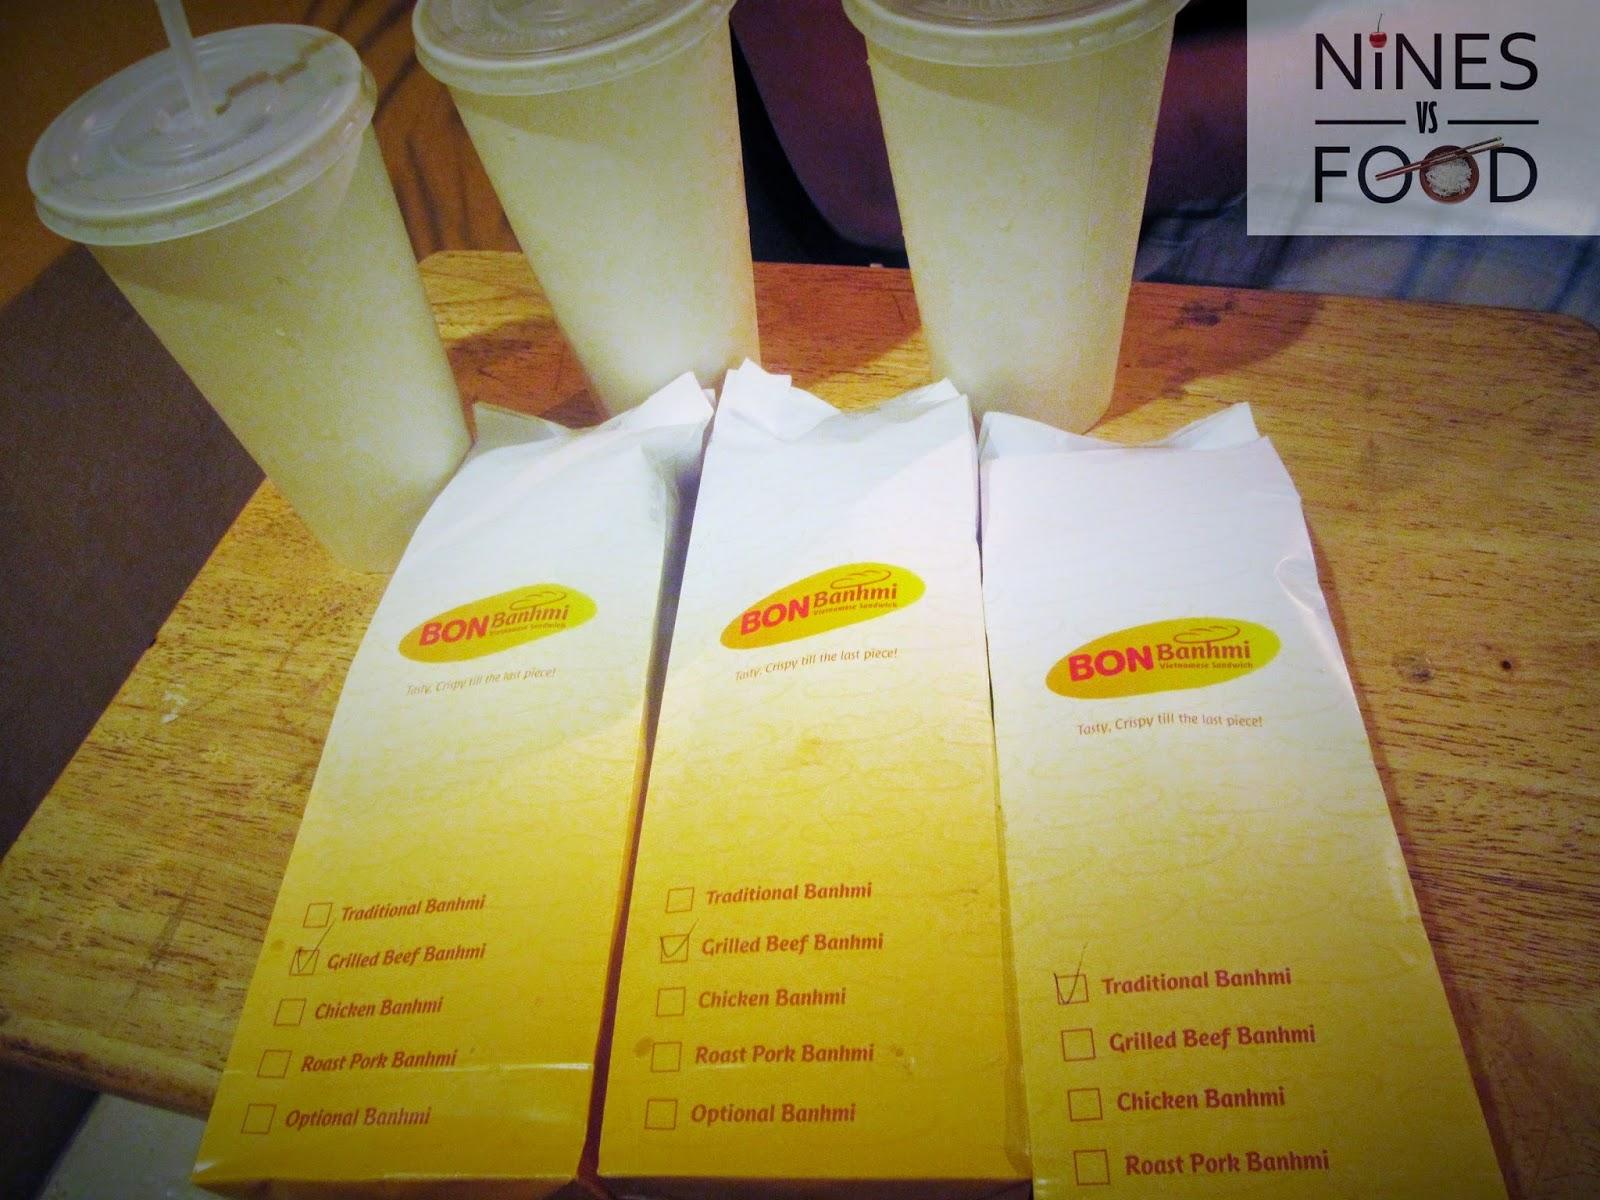 Nines vs. Food - Bon Banhmi Makati-9.jpg